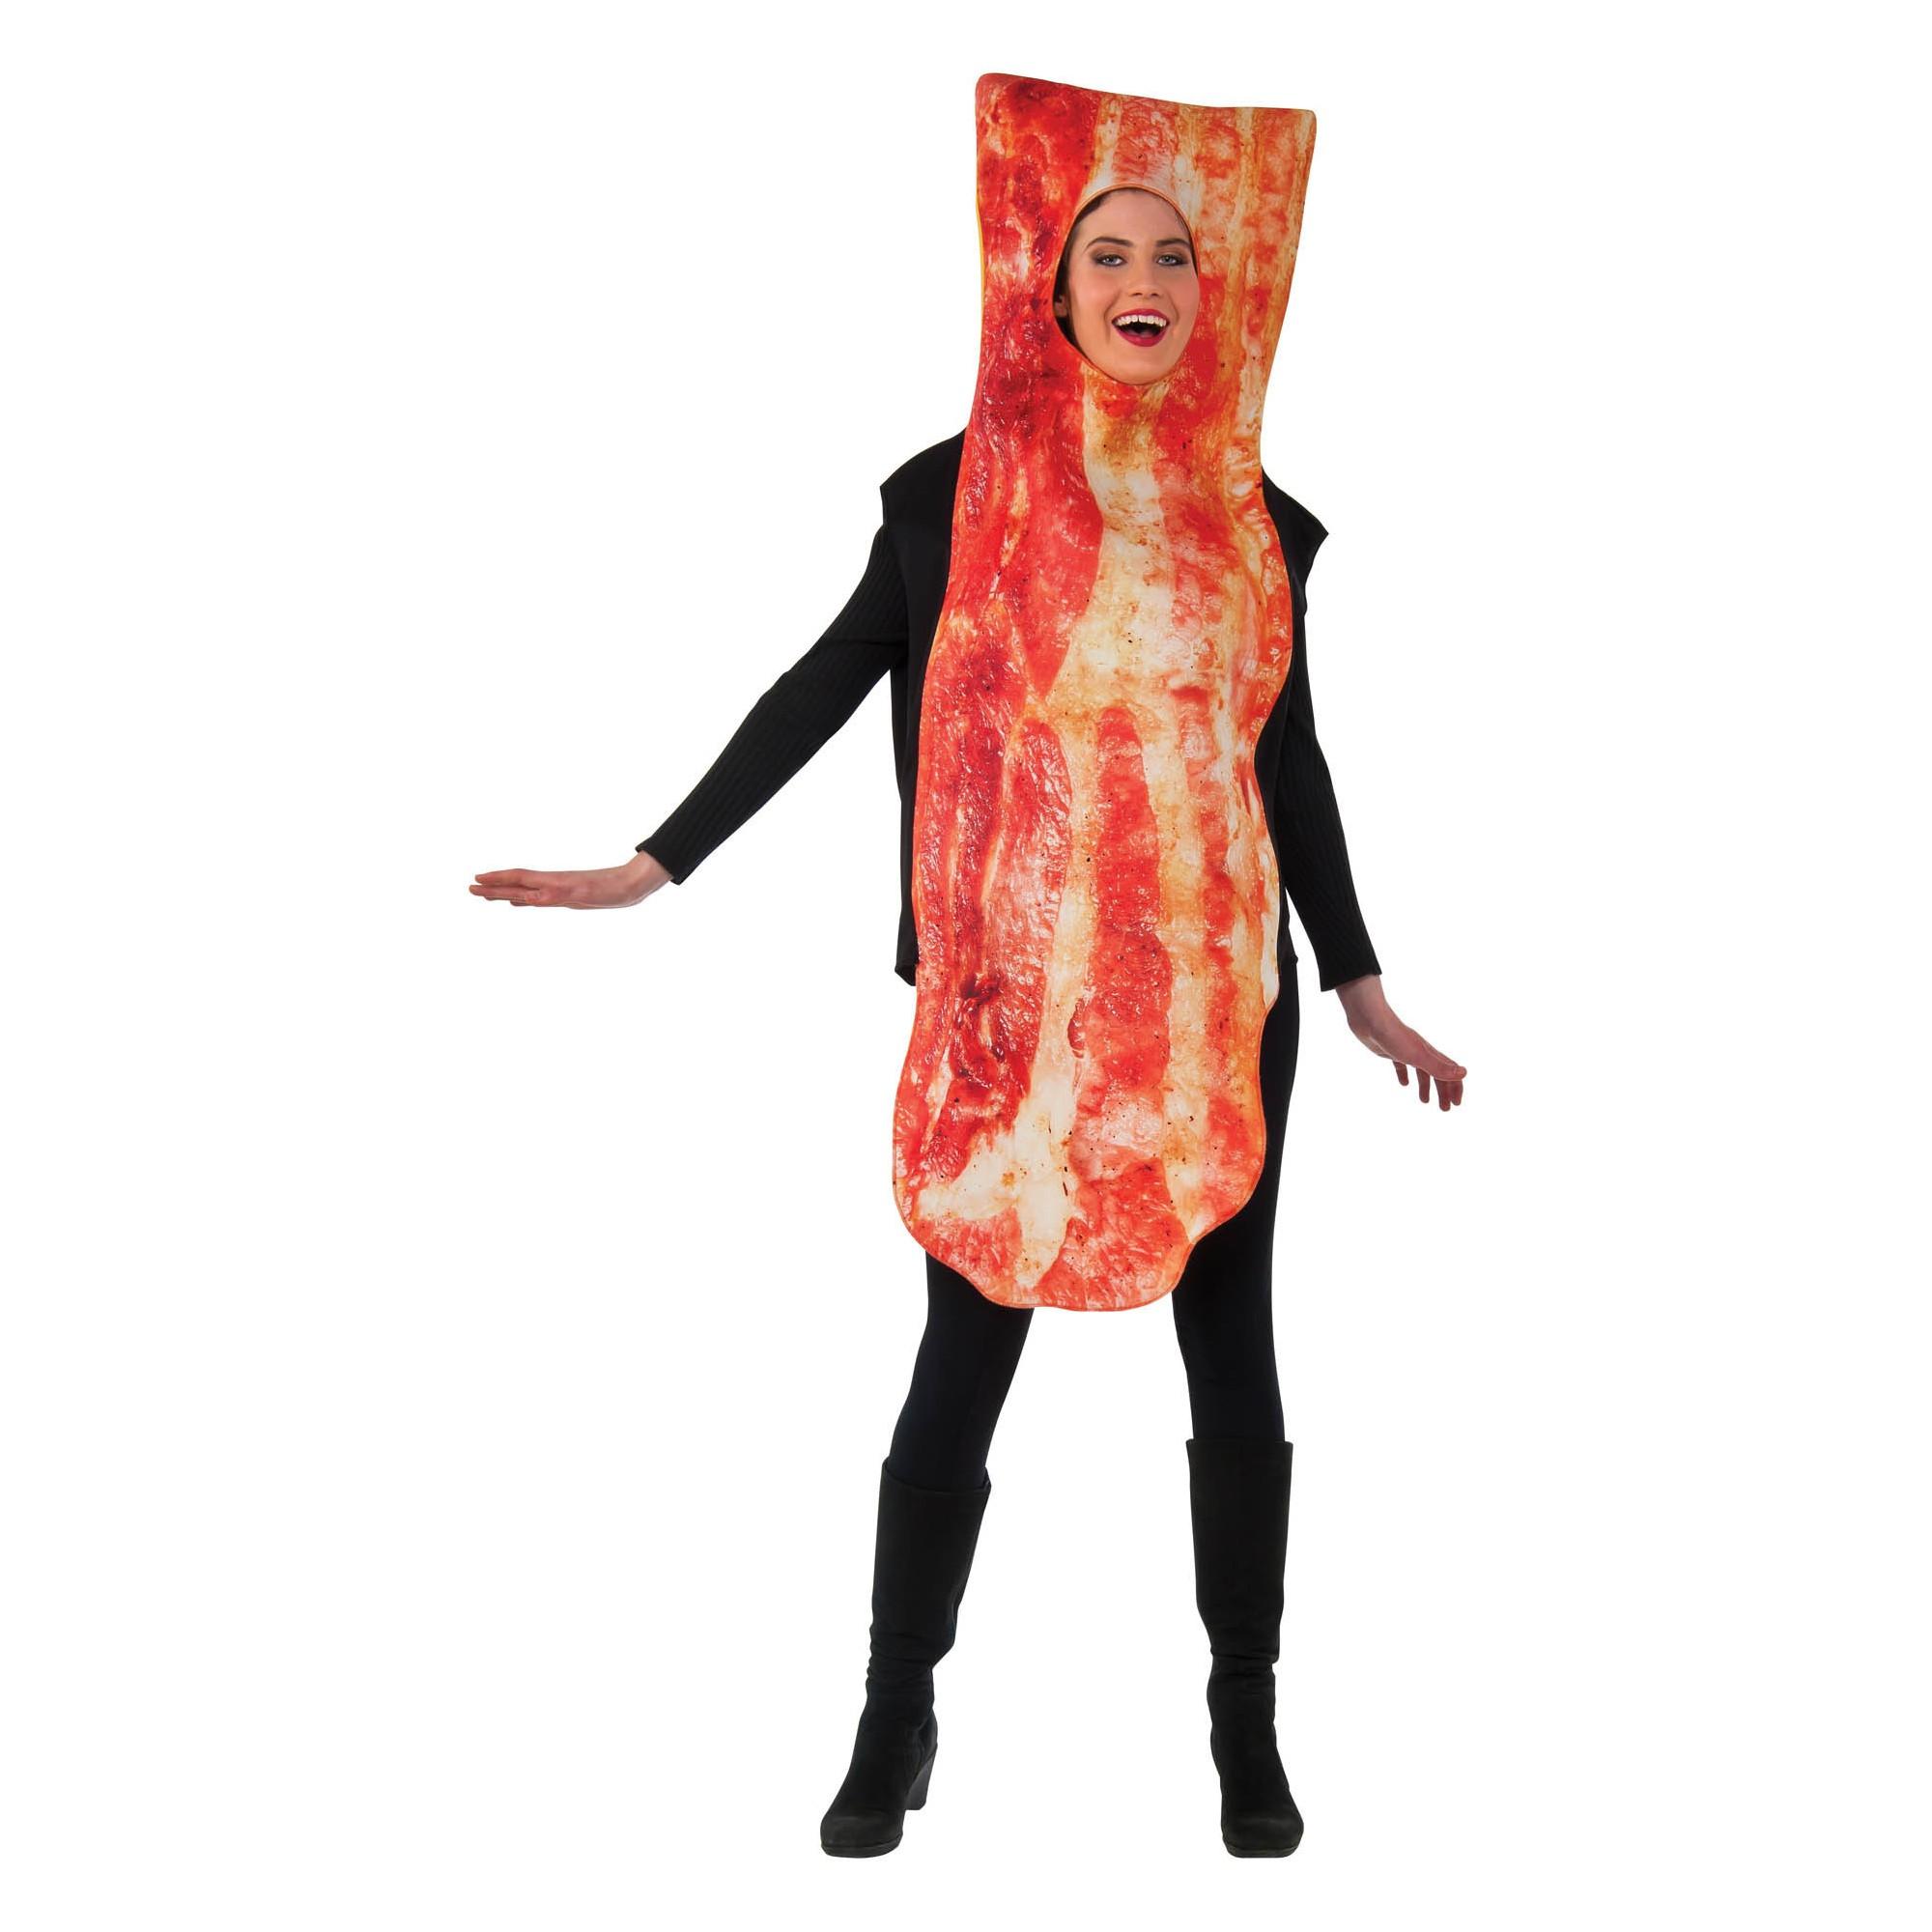 Adult Bacon Halloween Costume, Adult Unisex, Multi-Colored